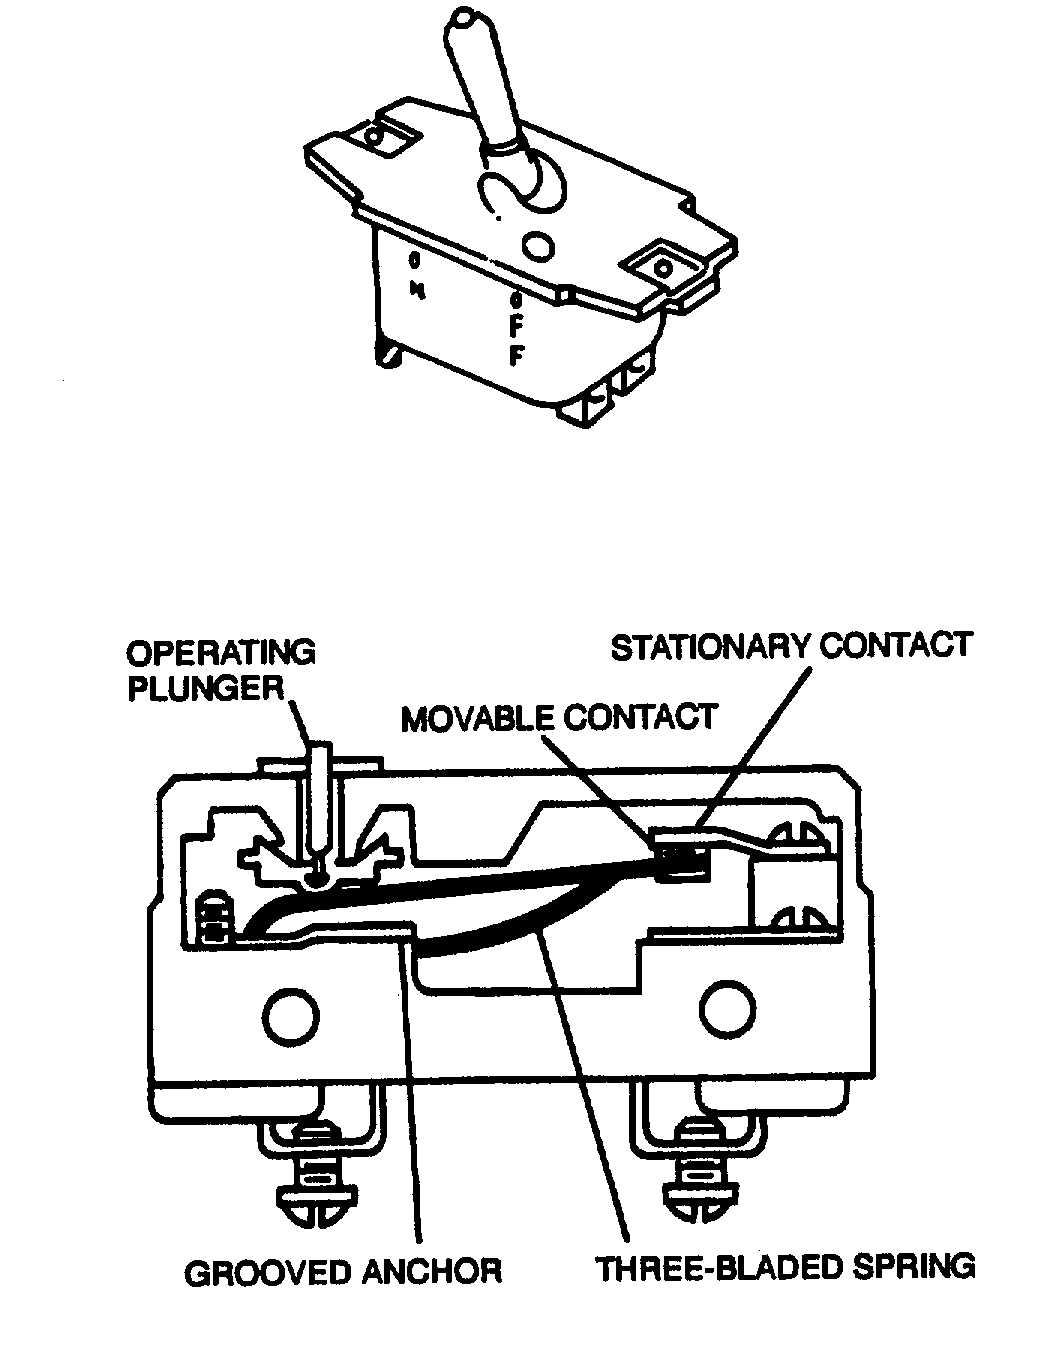 Figure 3-11. Microswitch